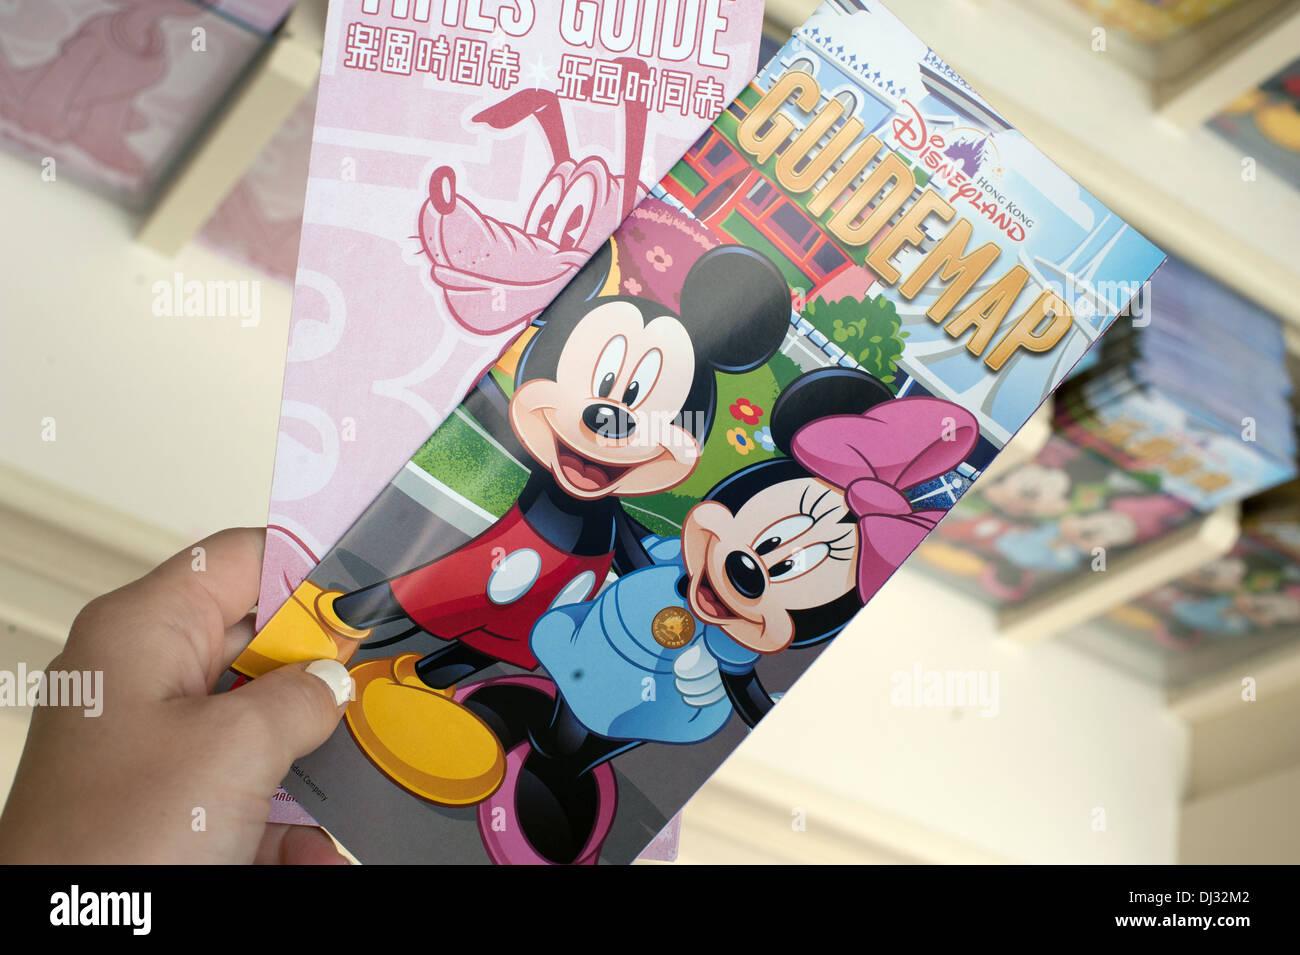 Hong Kong Disneyland Resort Guide Map Stock Photo 62762898 Alamy